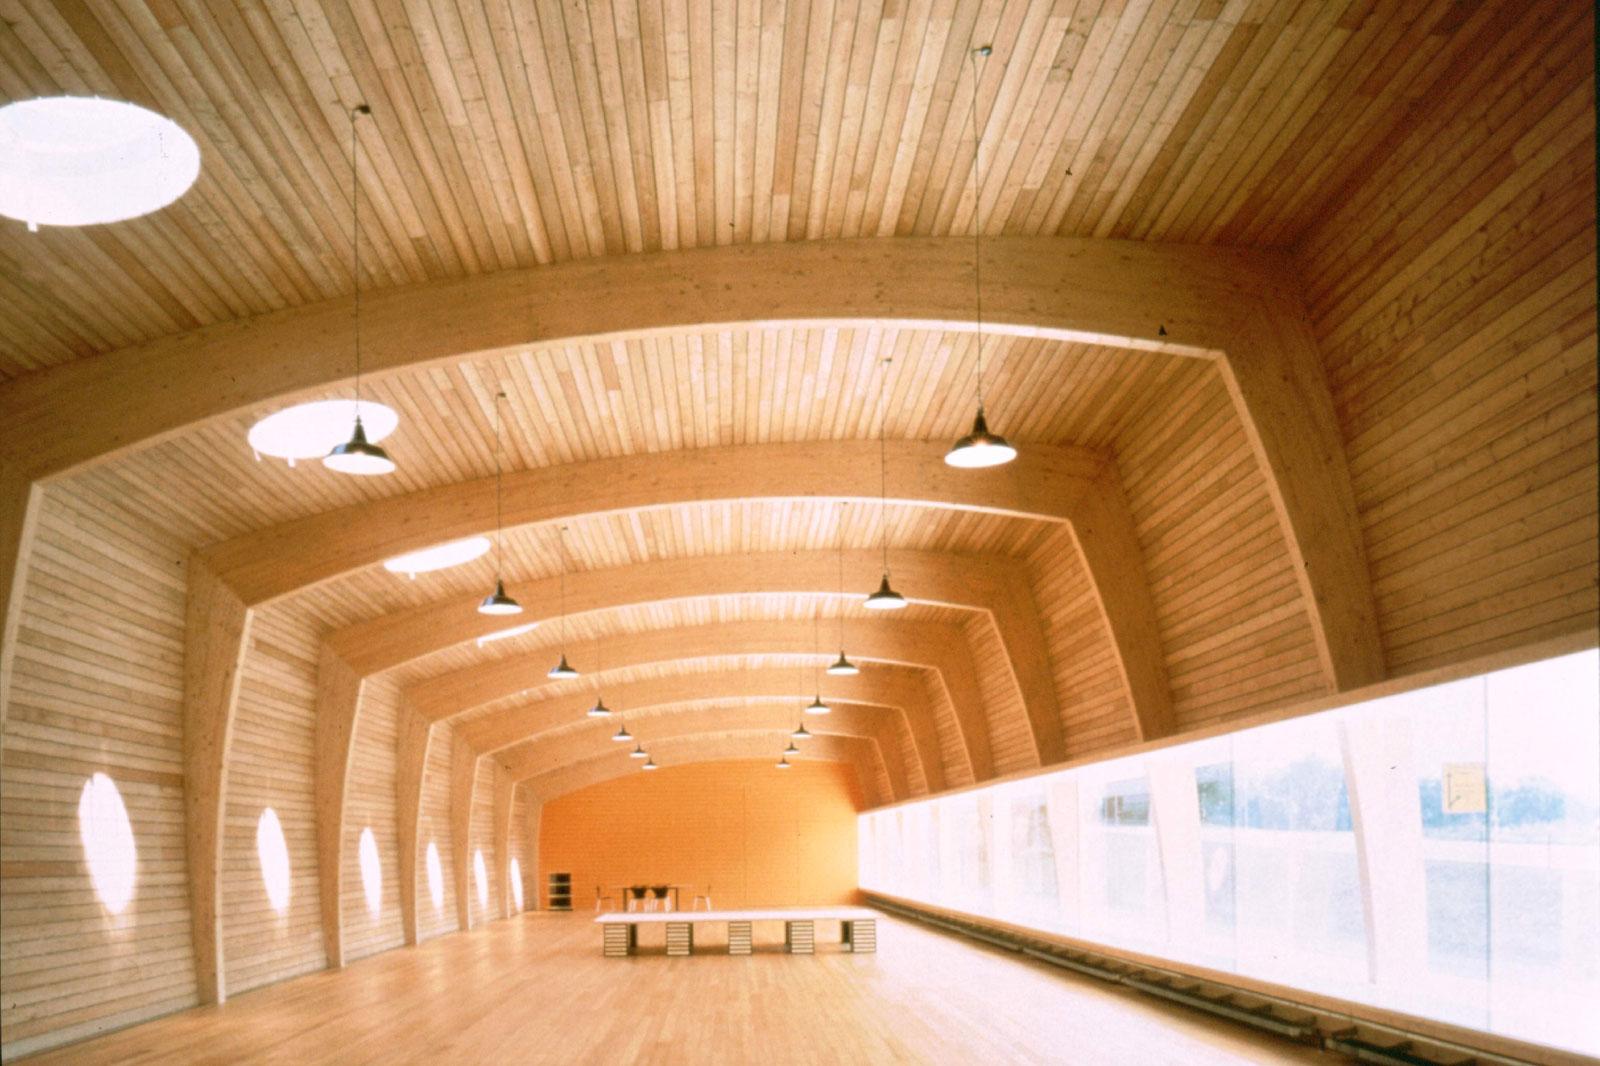 Brico castellar almacen de maderas vigas pergolas - Estructura madera laminada ...